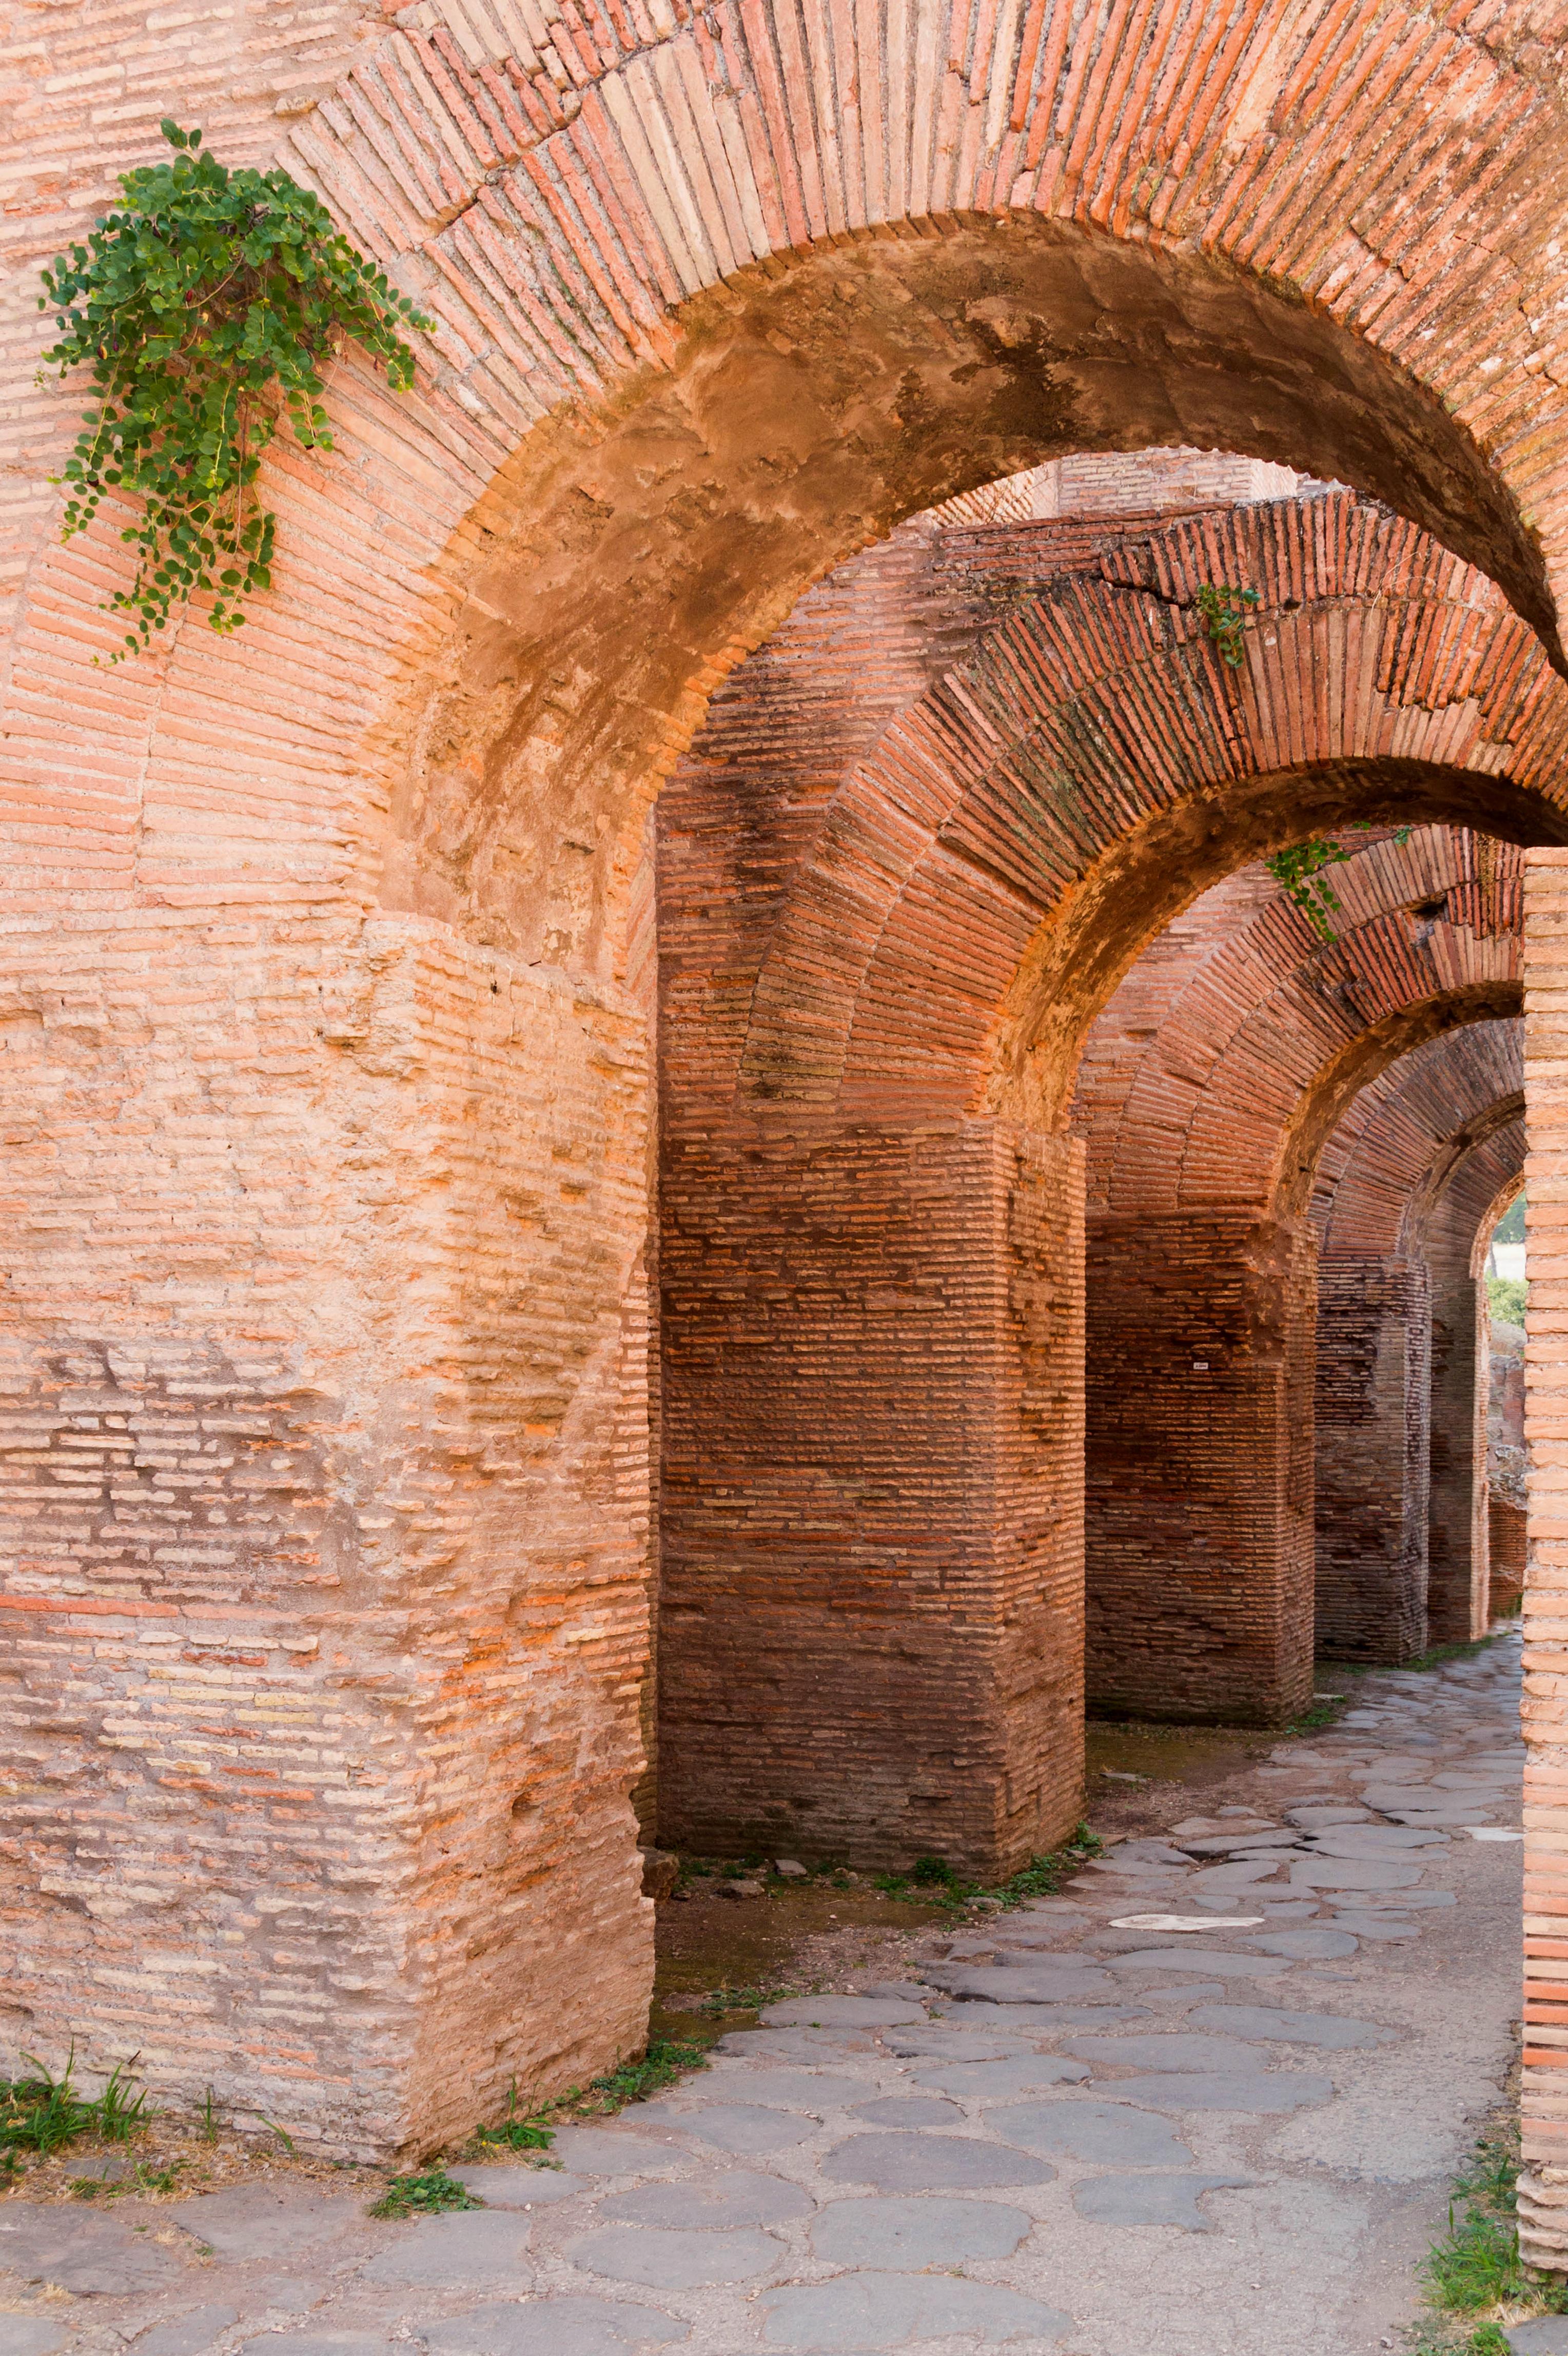 file brick arches forum romanum rome jpg wikimedia commons